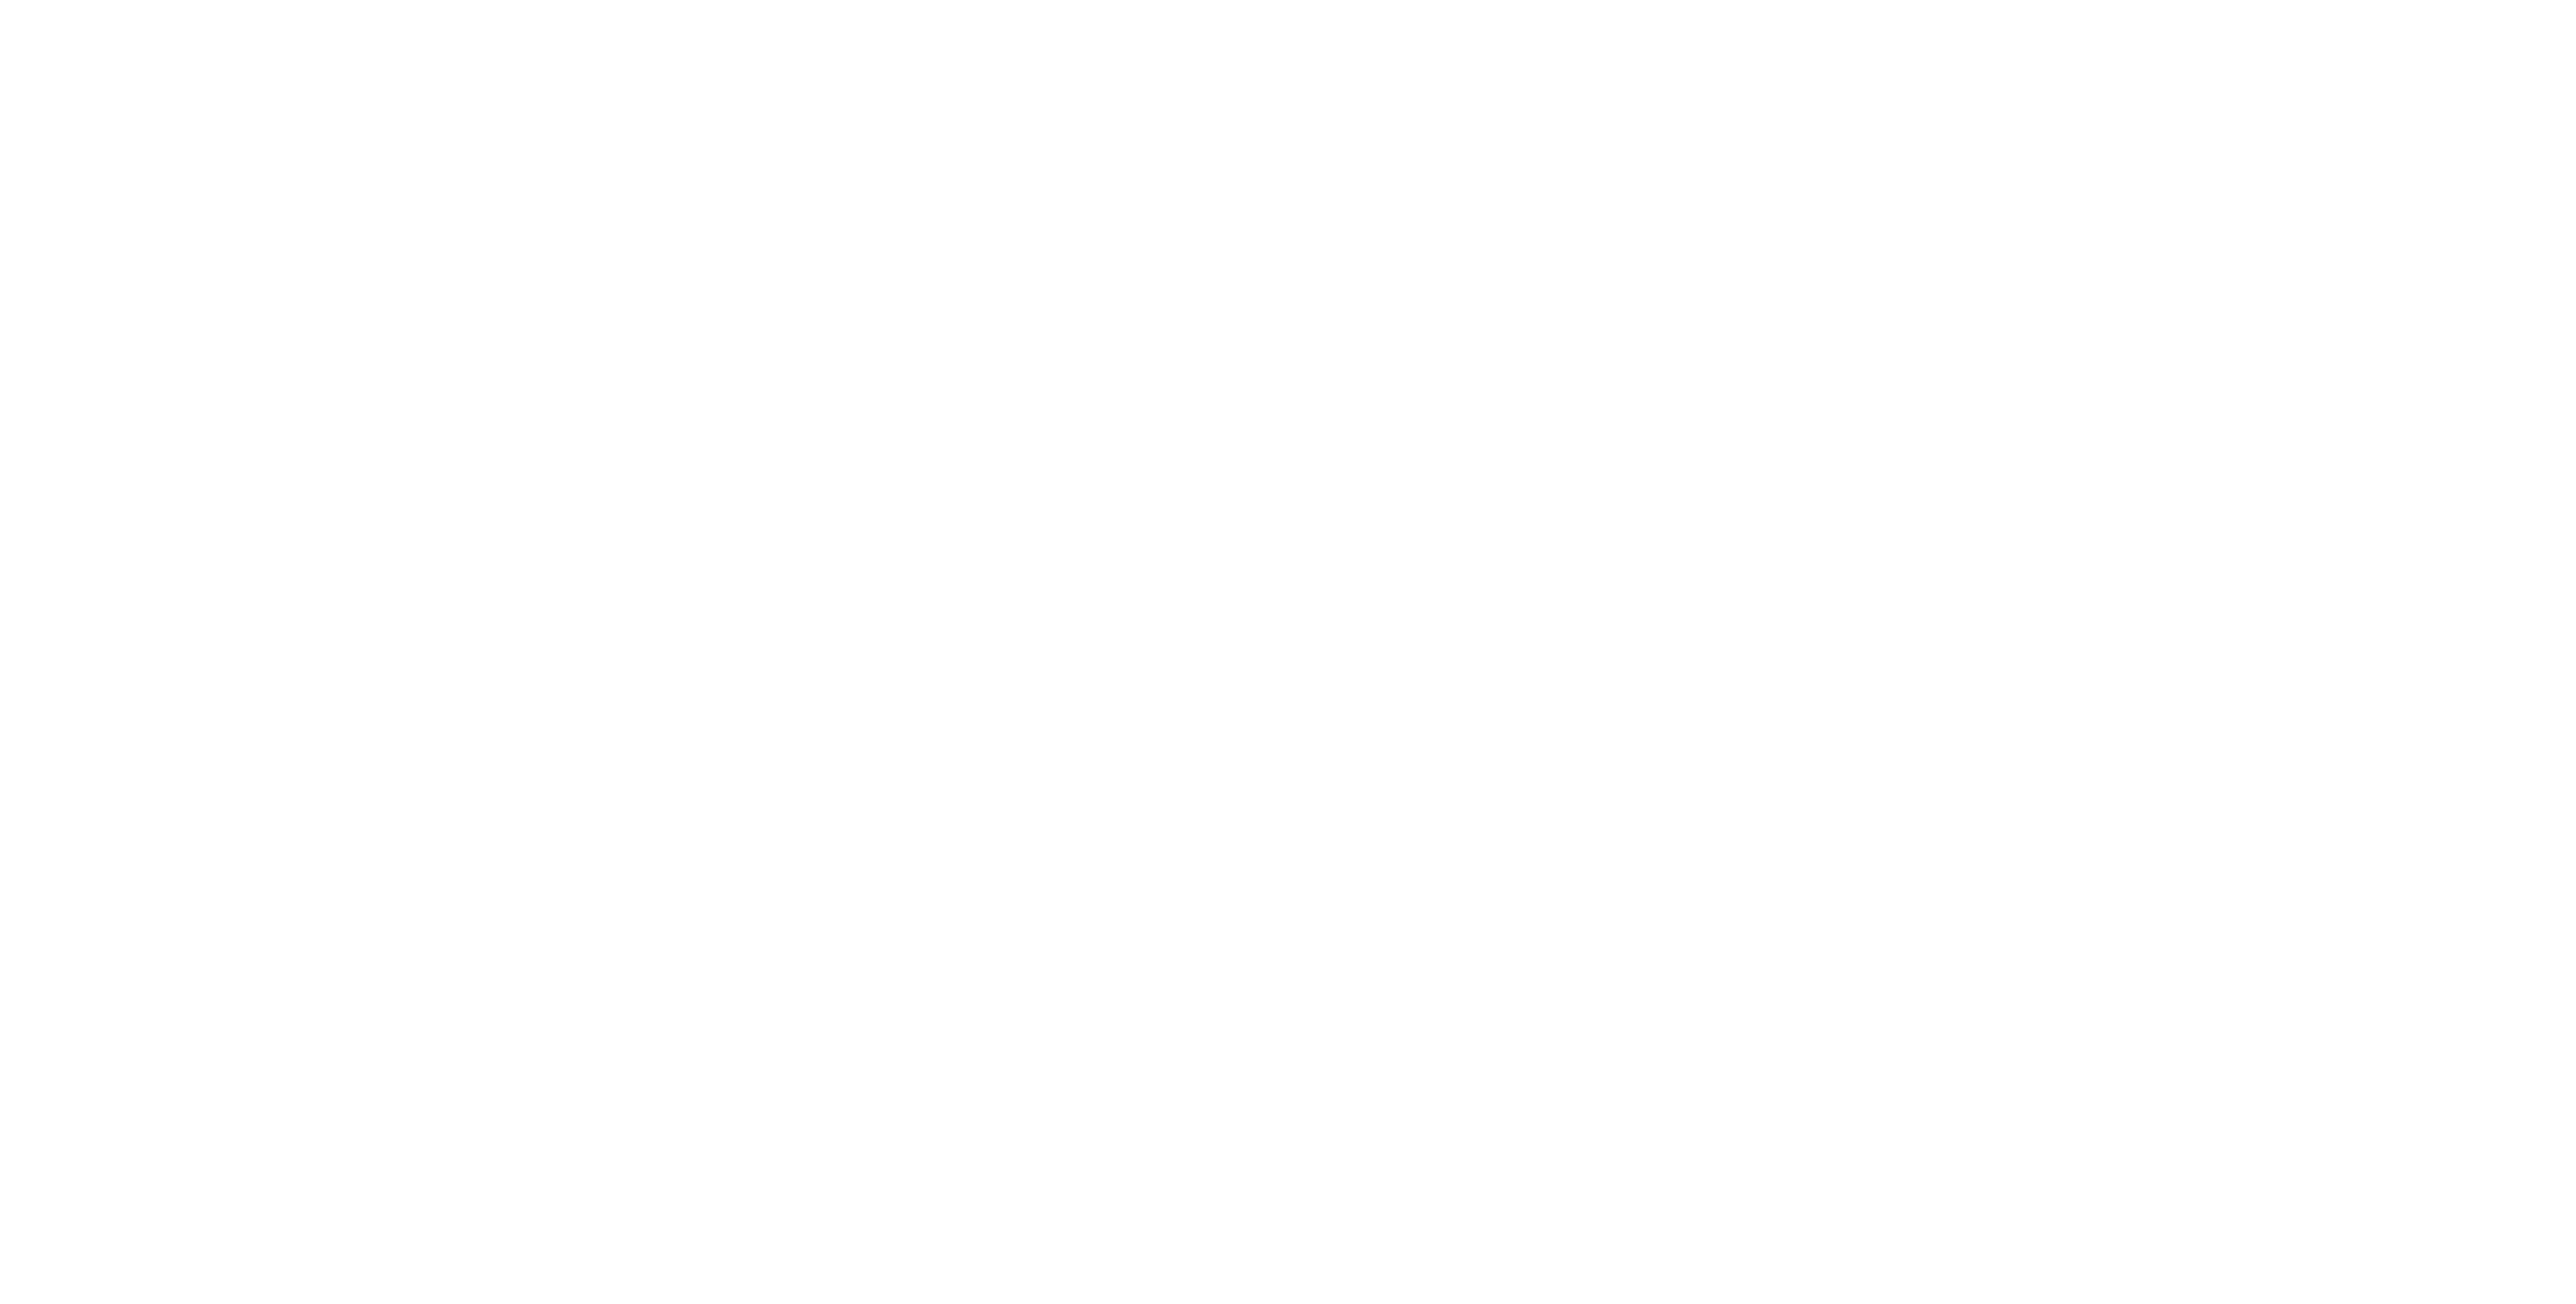 Alpine Green